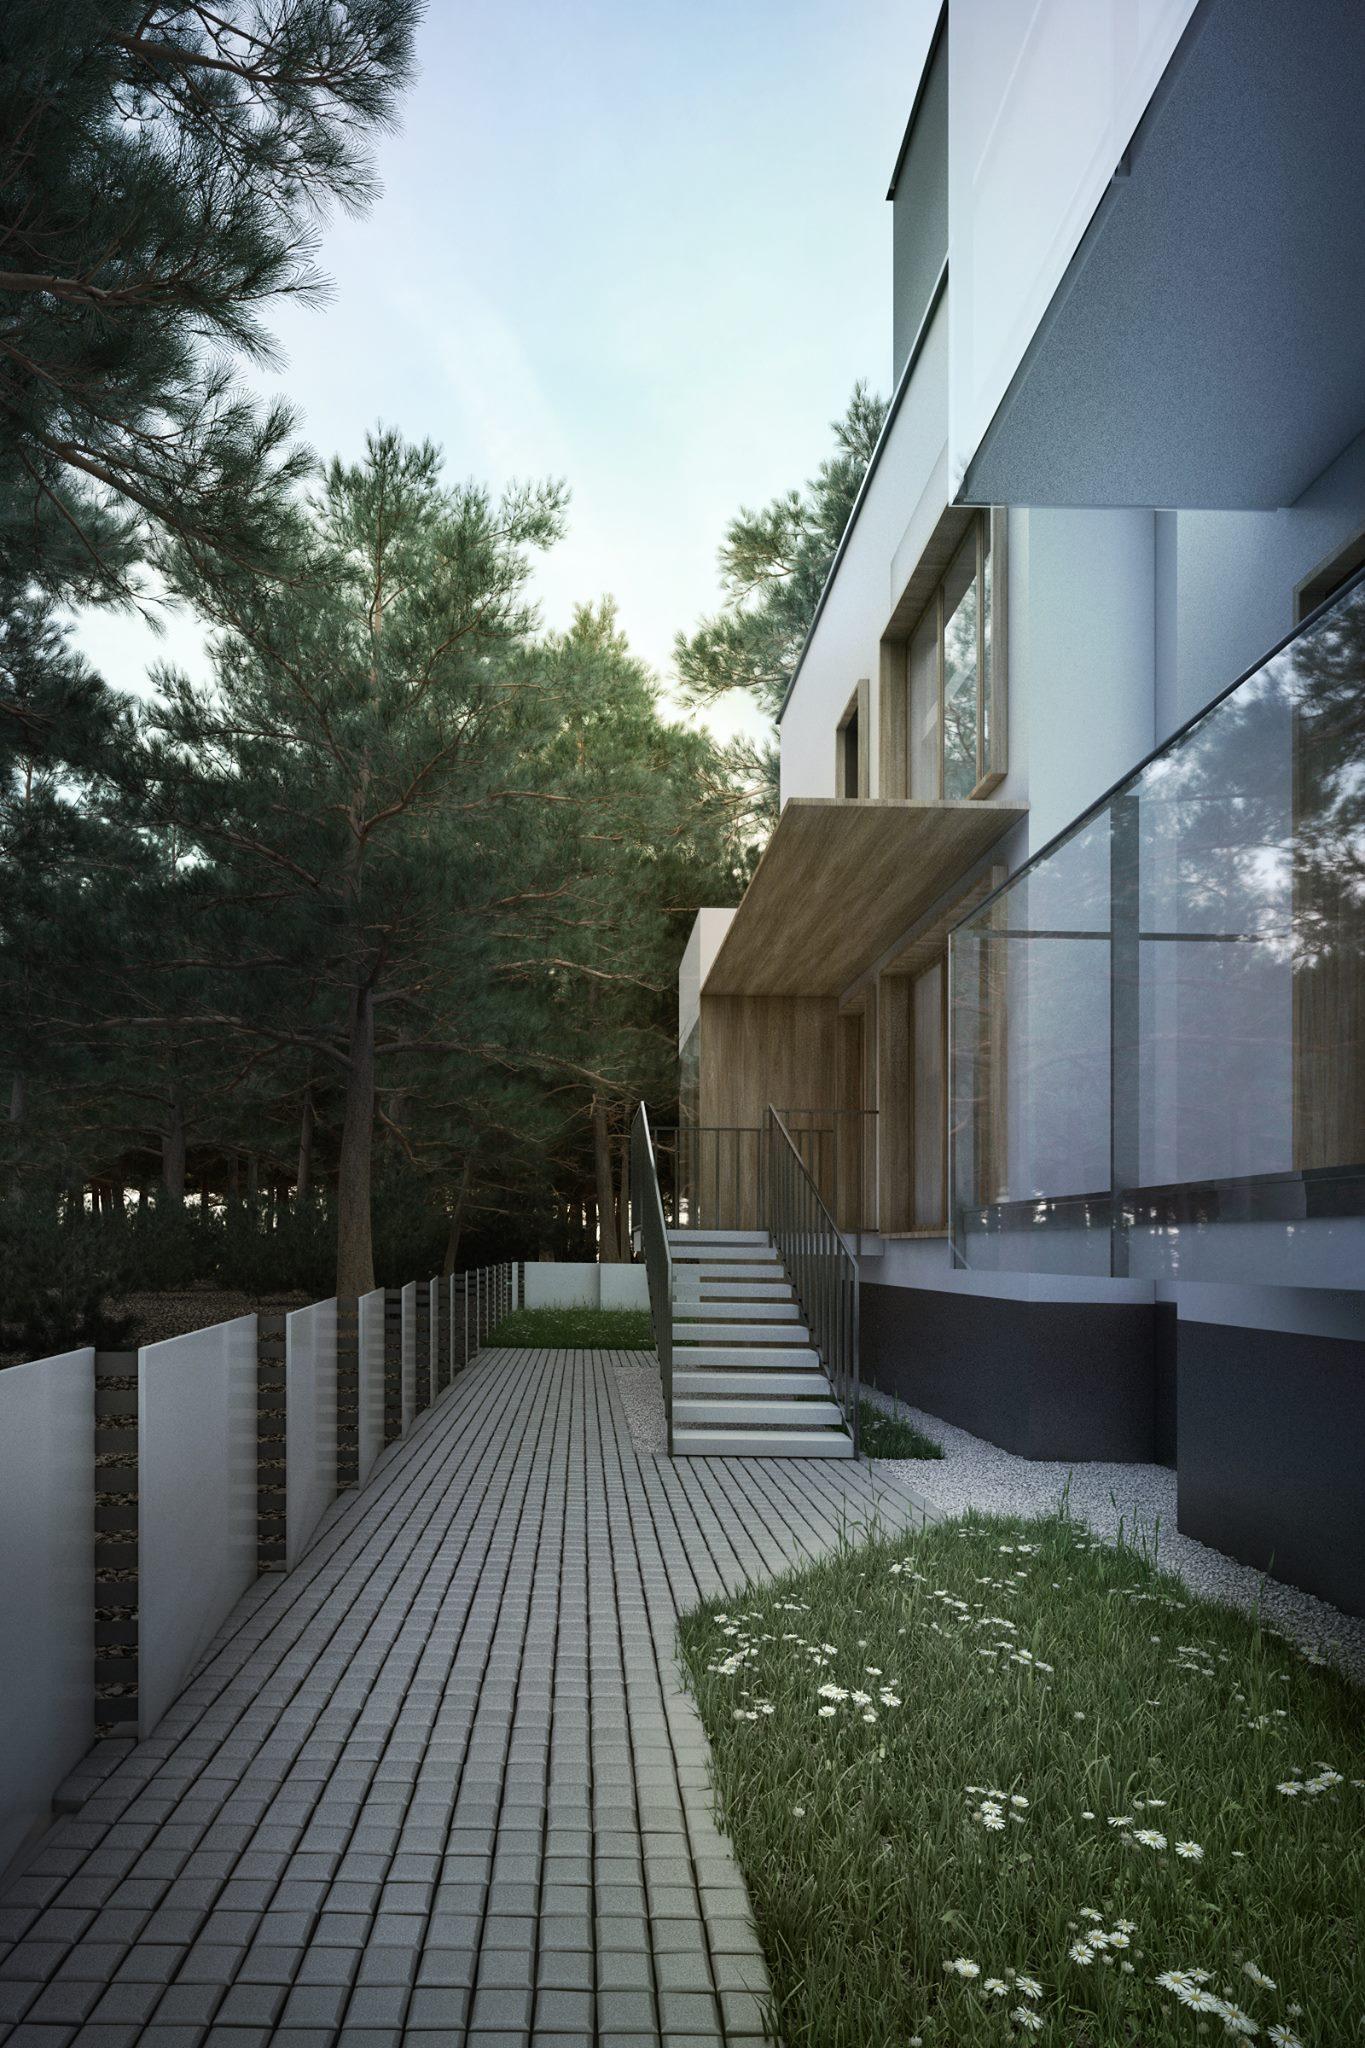 Residential complex, Jurata